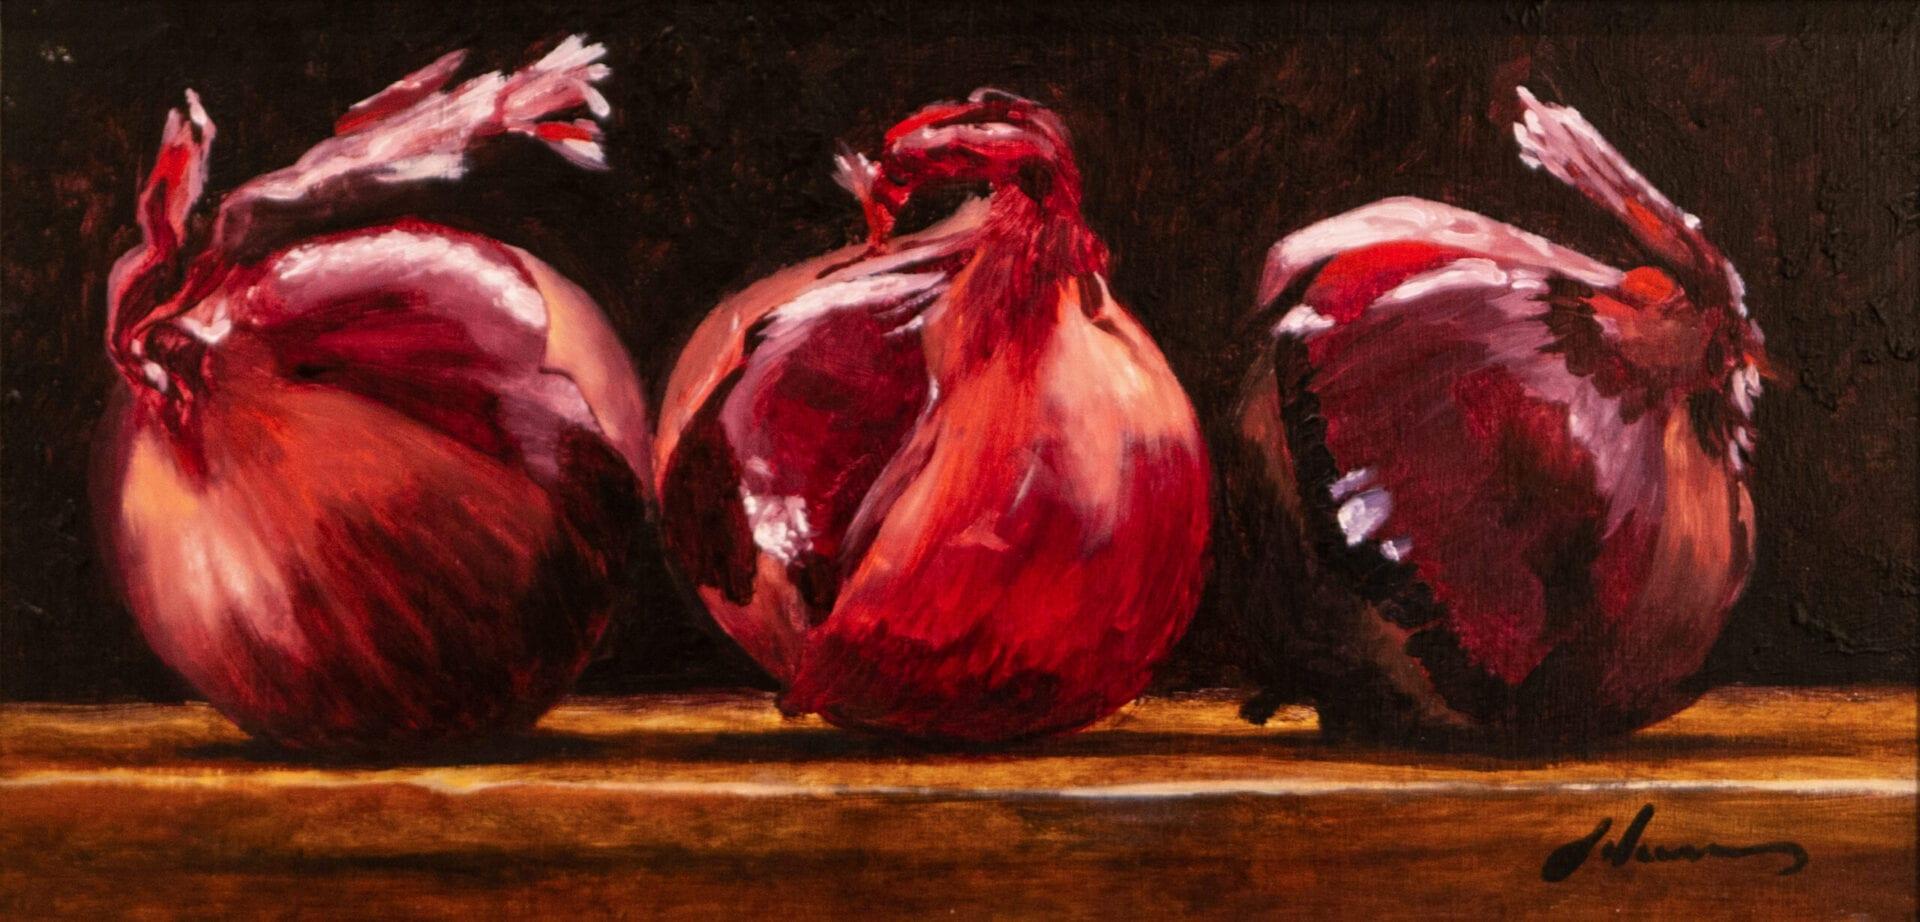 Michael Lynn Adams - Red Onion Trio